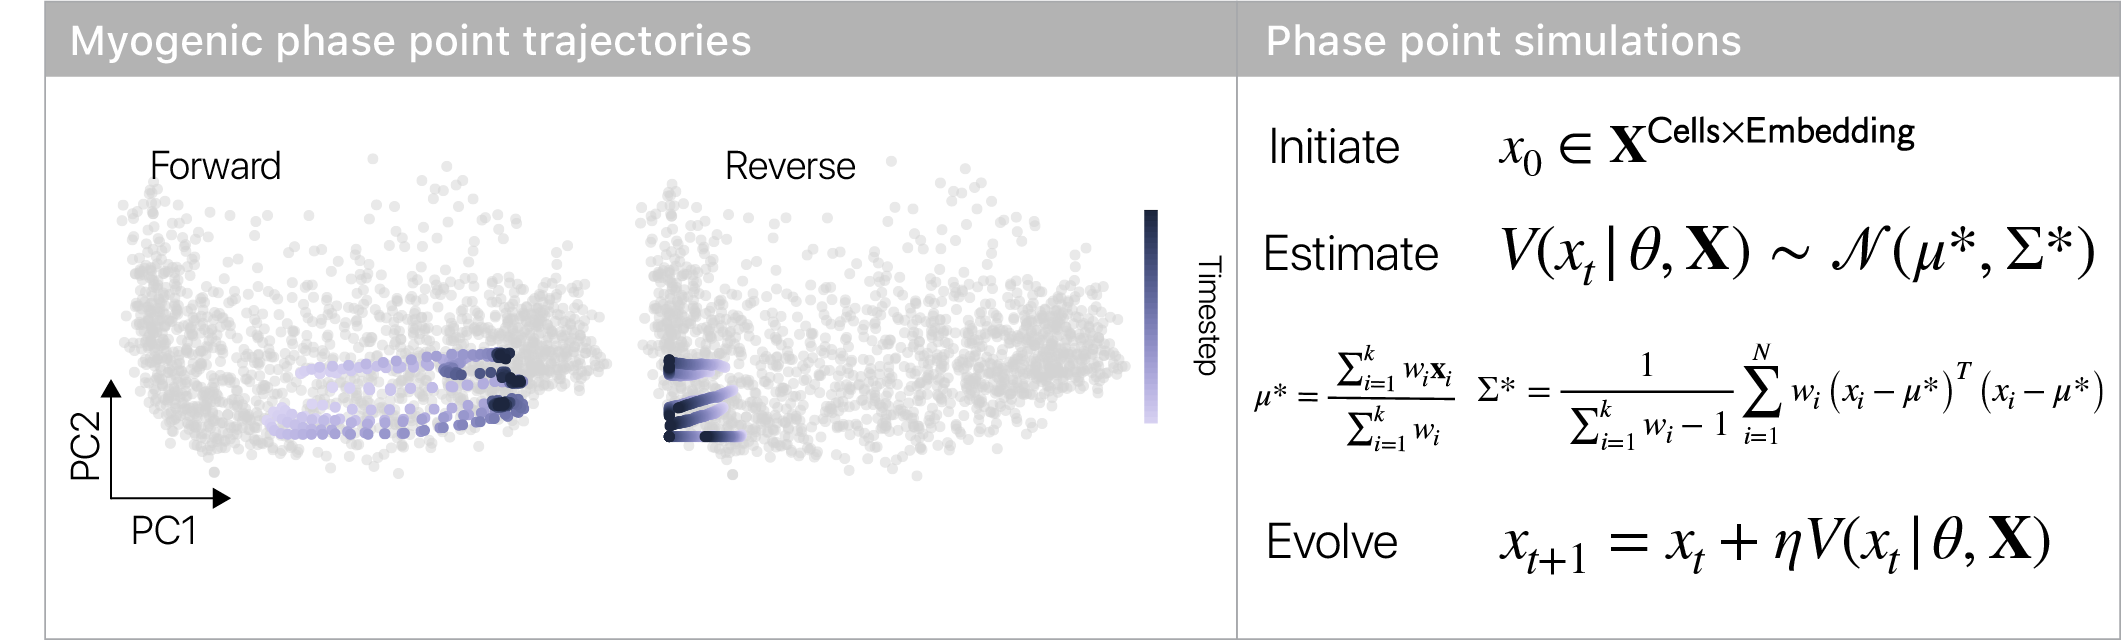 Phase simulations